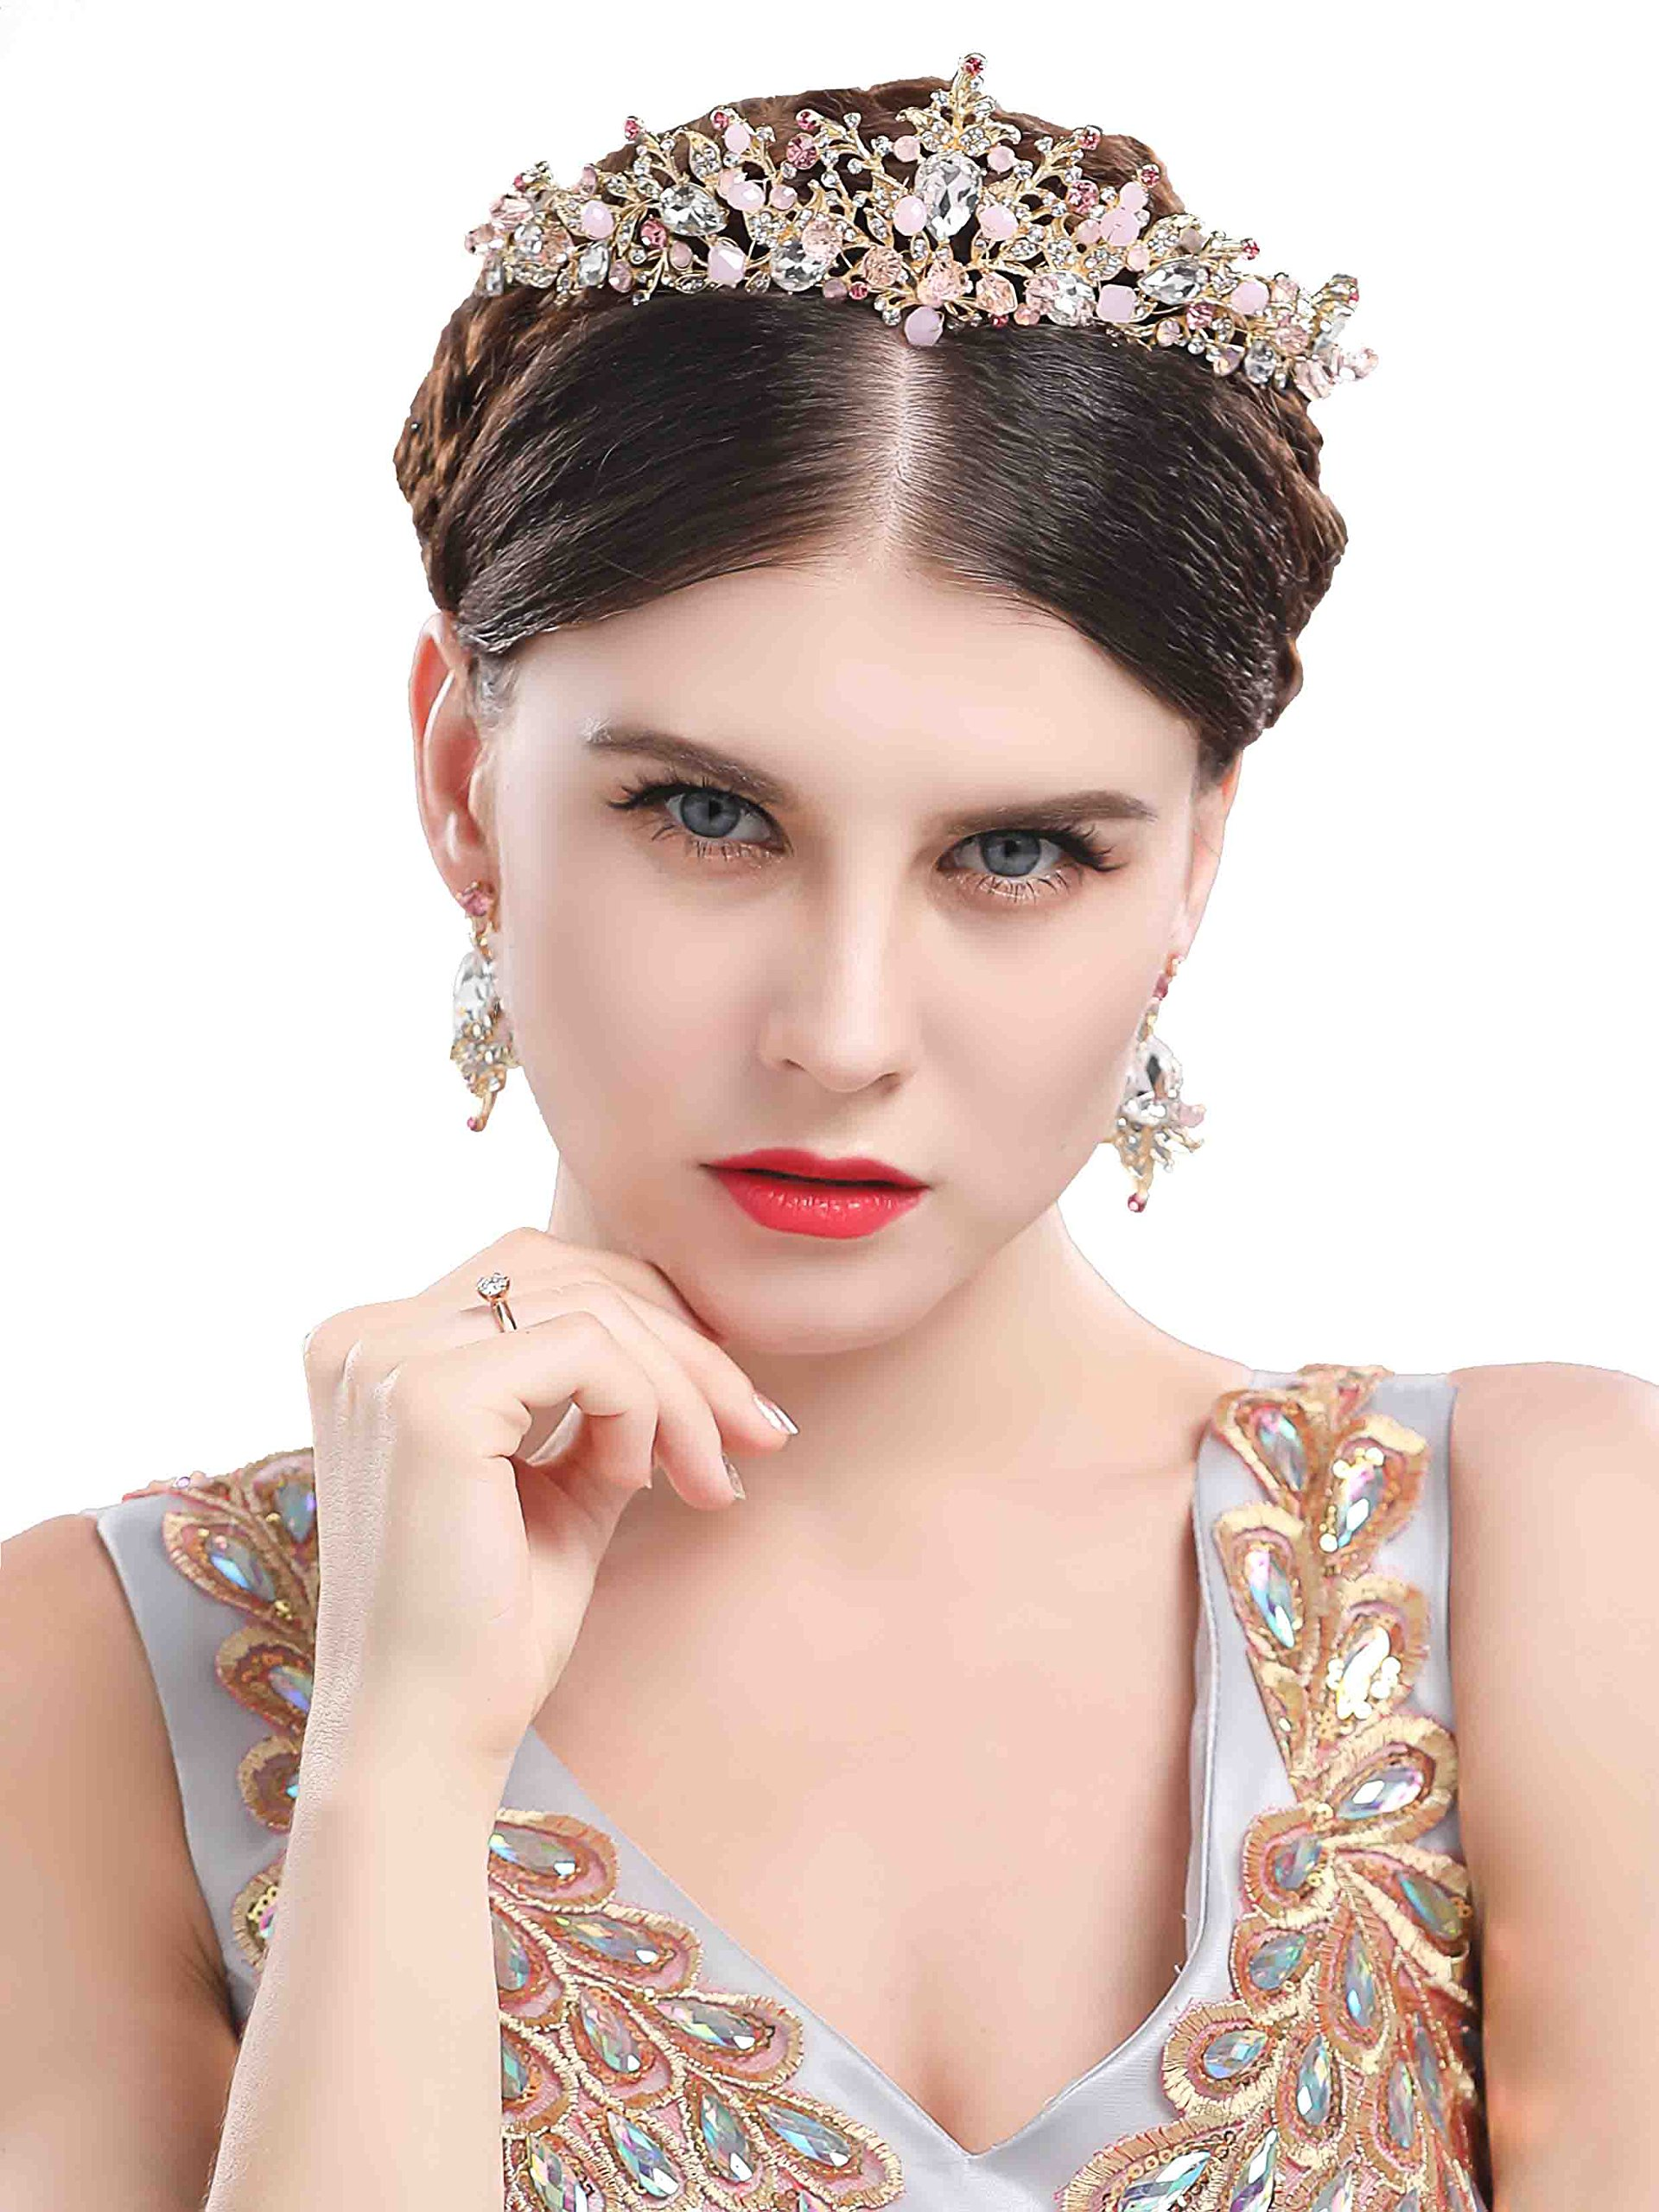 Chicer Baroque wedding Crown Tiara Queen Princess Vintage Rhinestone Tiara Accessories for Women and Girls(Black).(Style B)